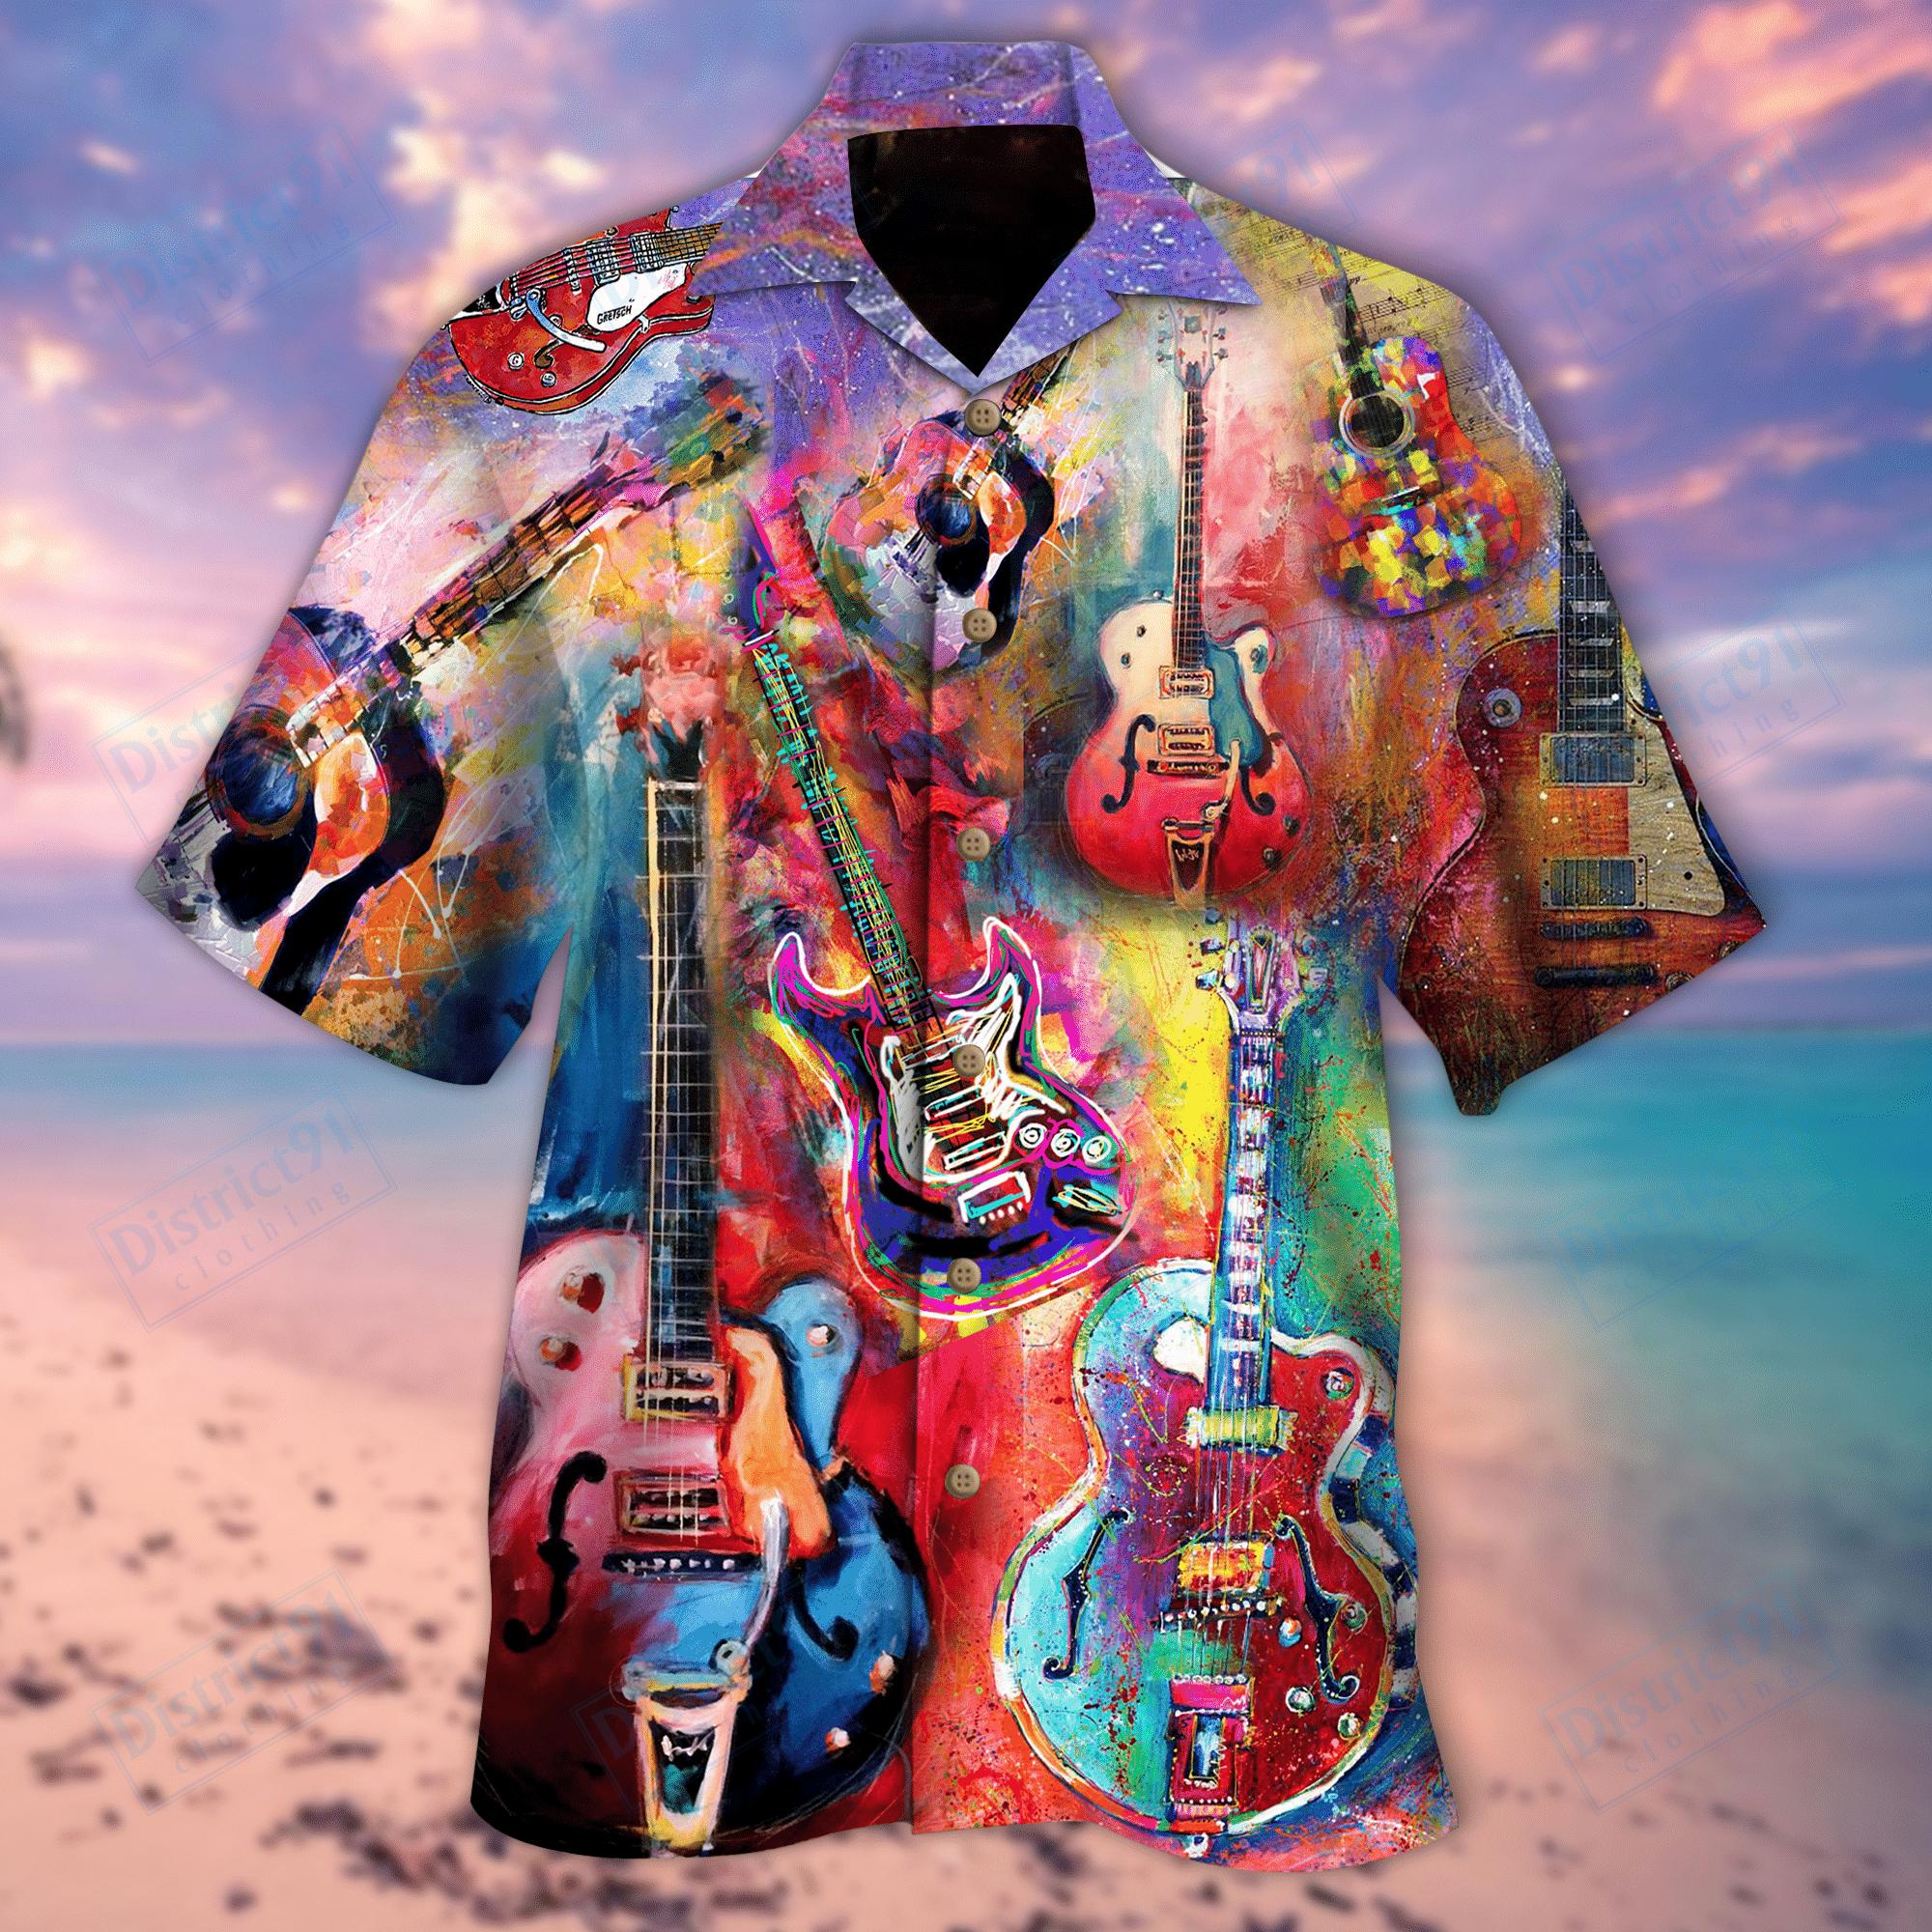 Colorful Guitar Unisex Hawaiian Shirt